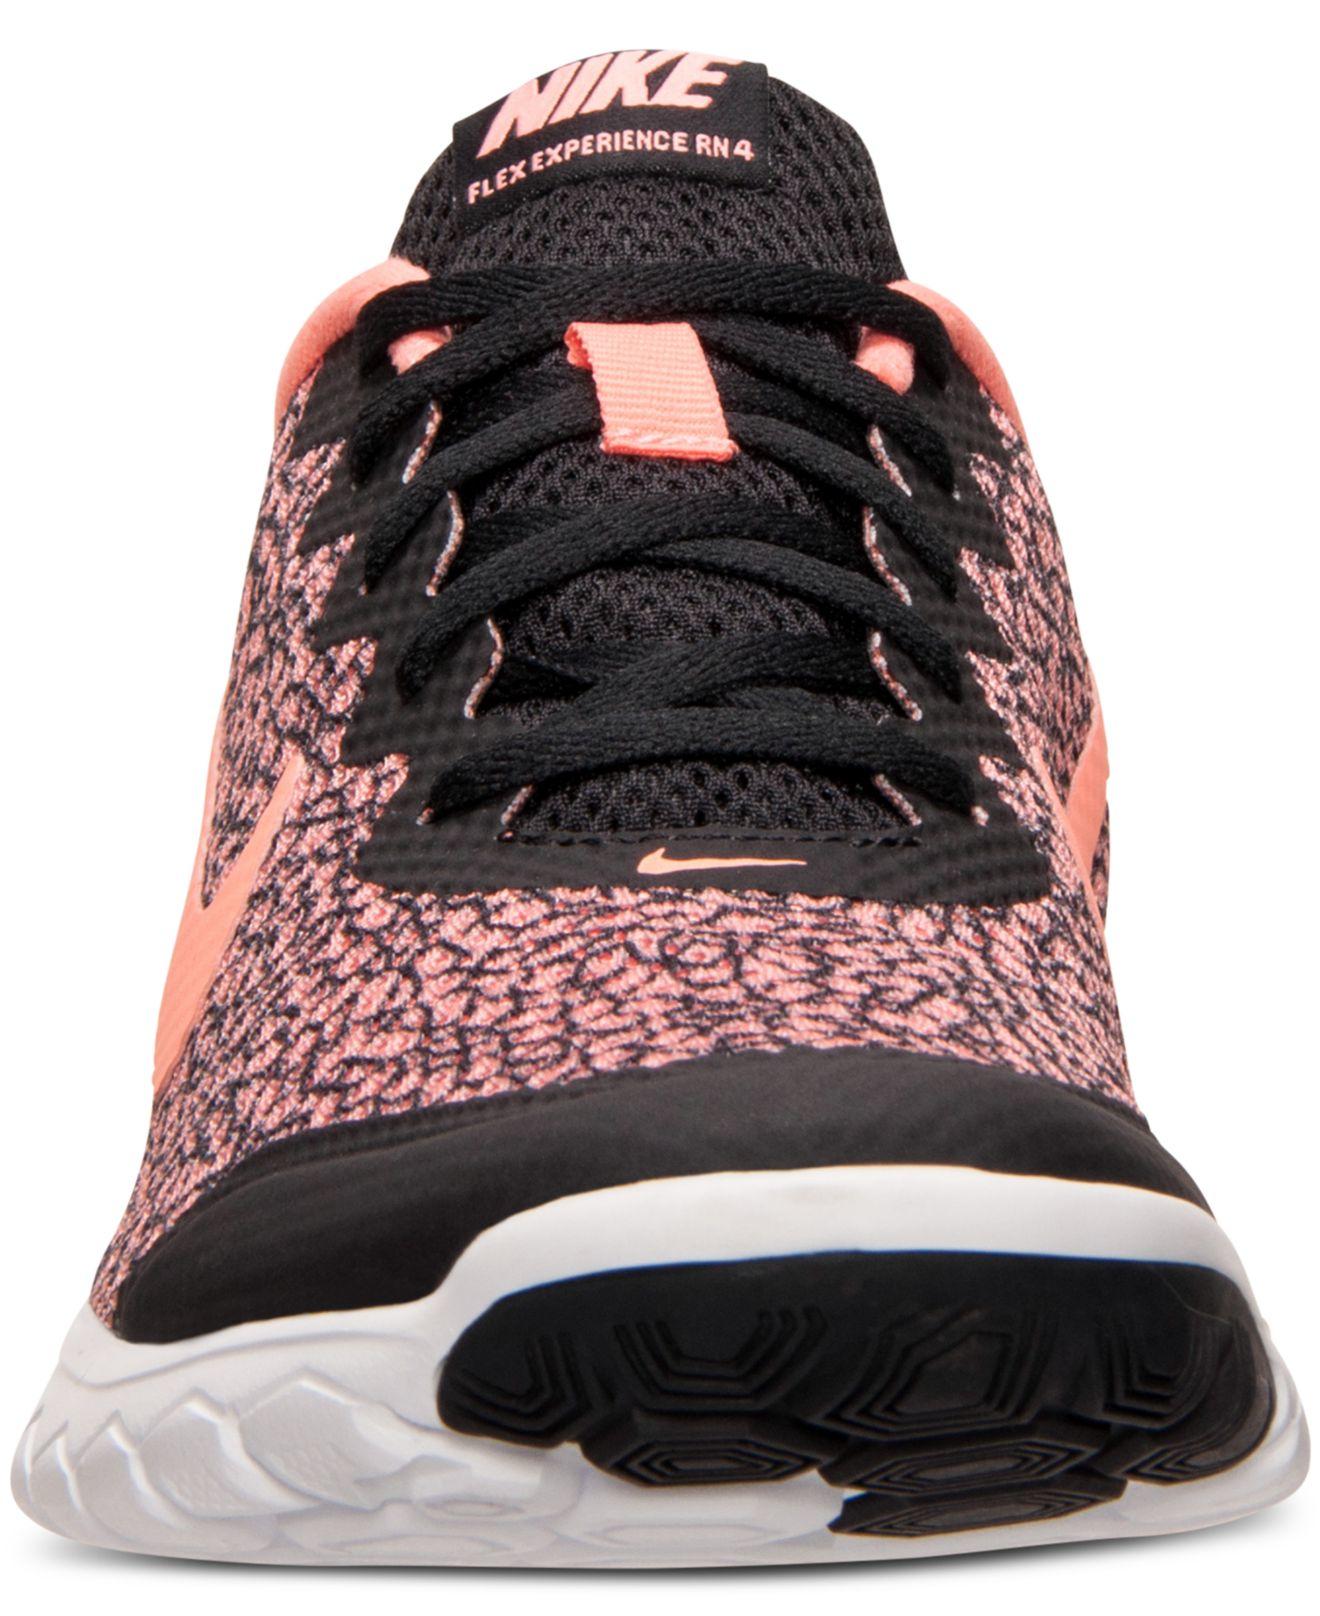 a166859175f6 Running Sneakers 4 Women s Experience Flex Lyst Run Nike Premium CfqwPv6